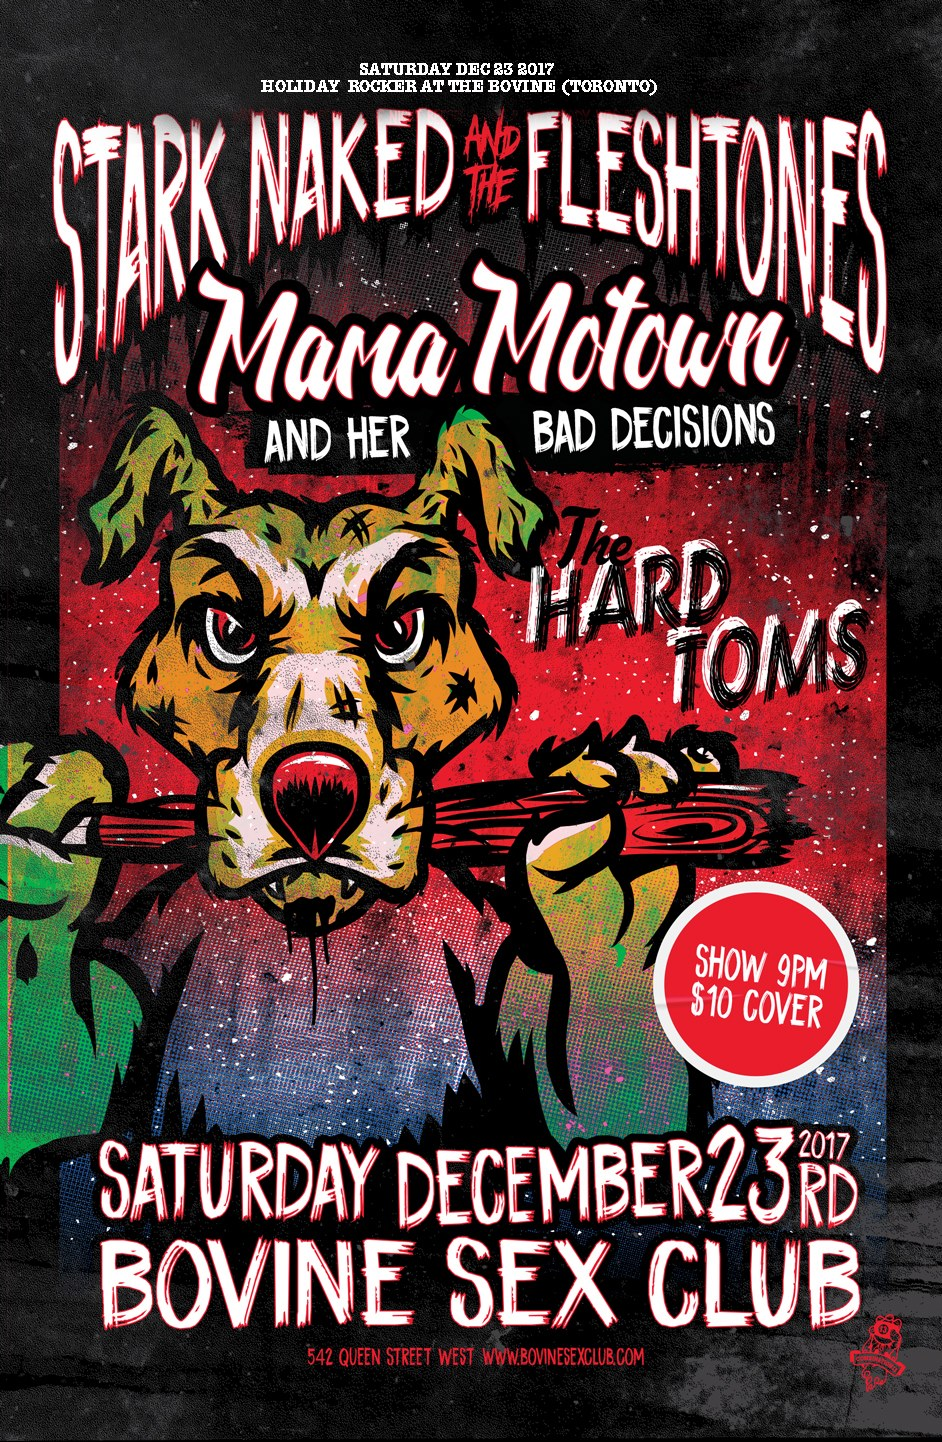 Stark Naked & The Fleshtones, Mama Motown, The Hard Toms